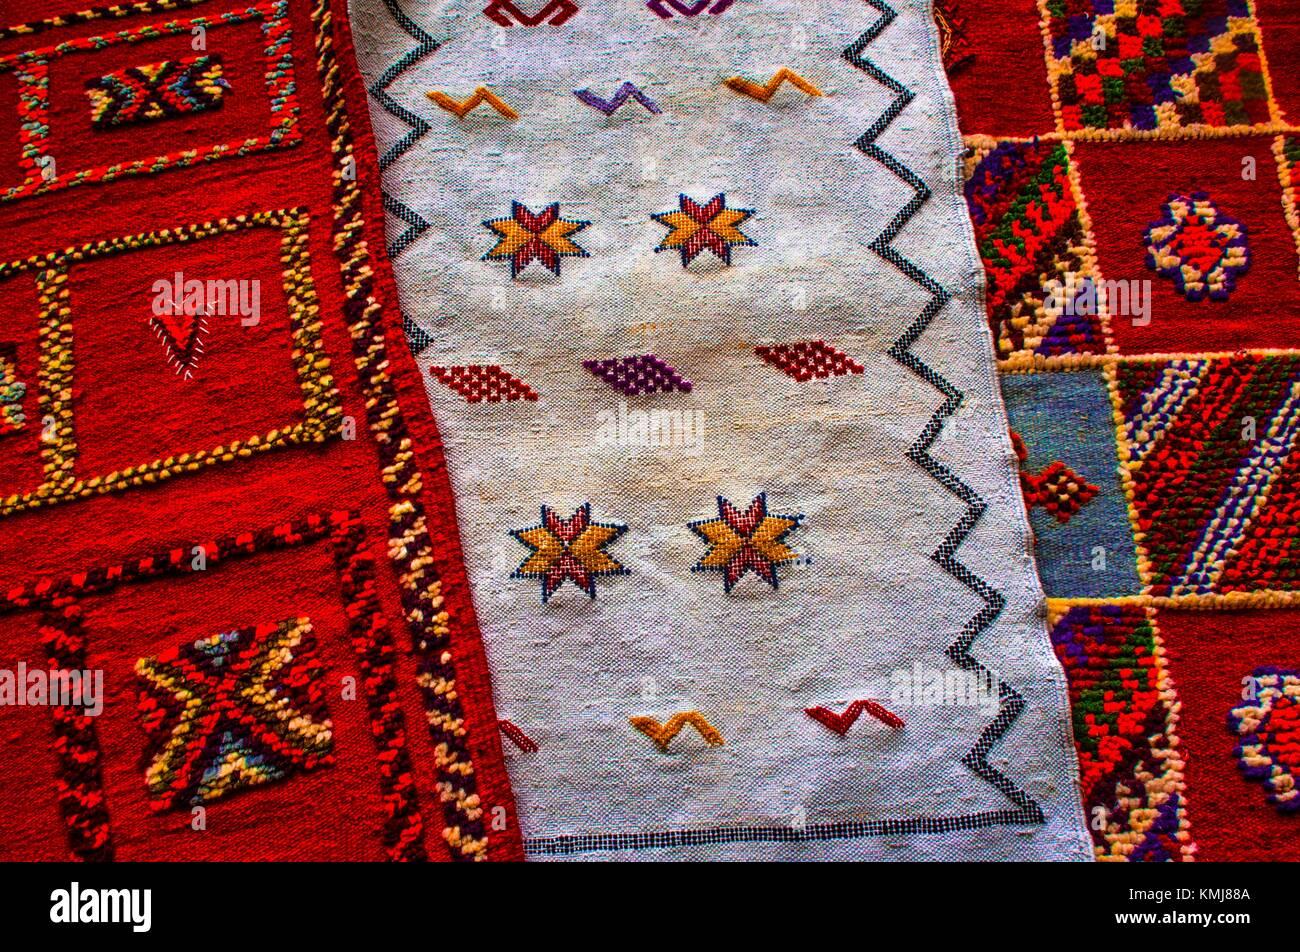 Morocco, Handicraft. Berber carpets - Stock Image